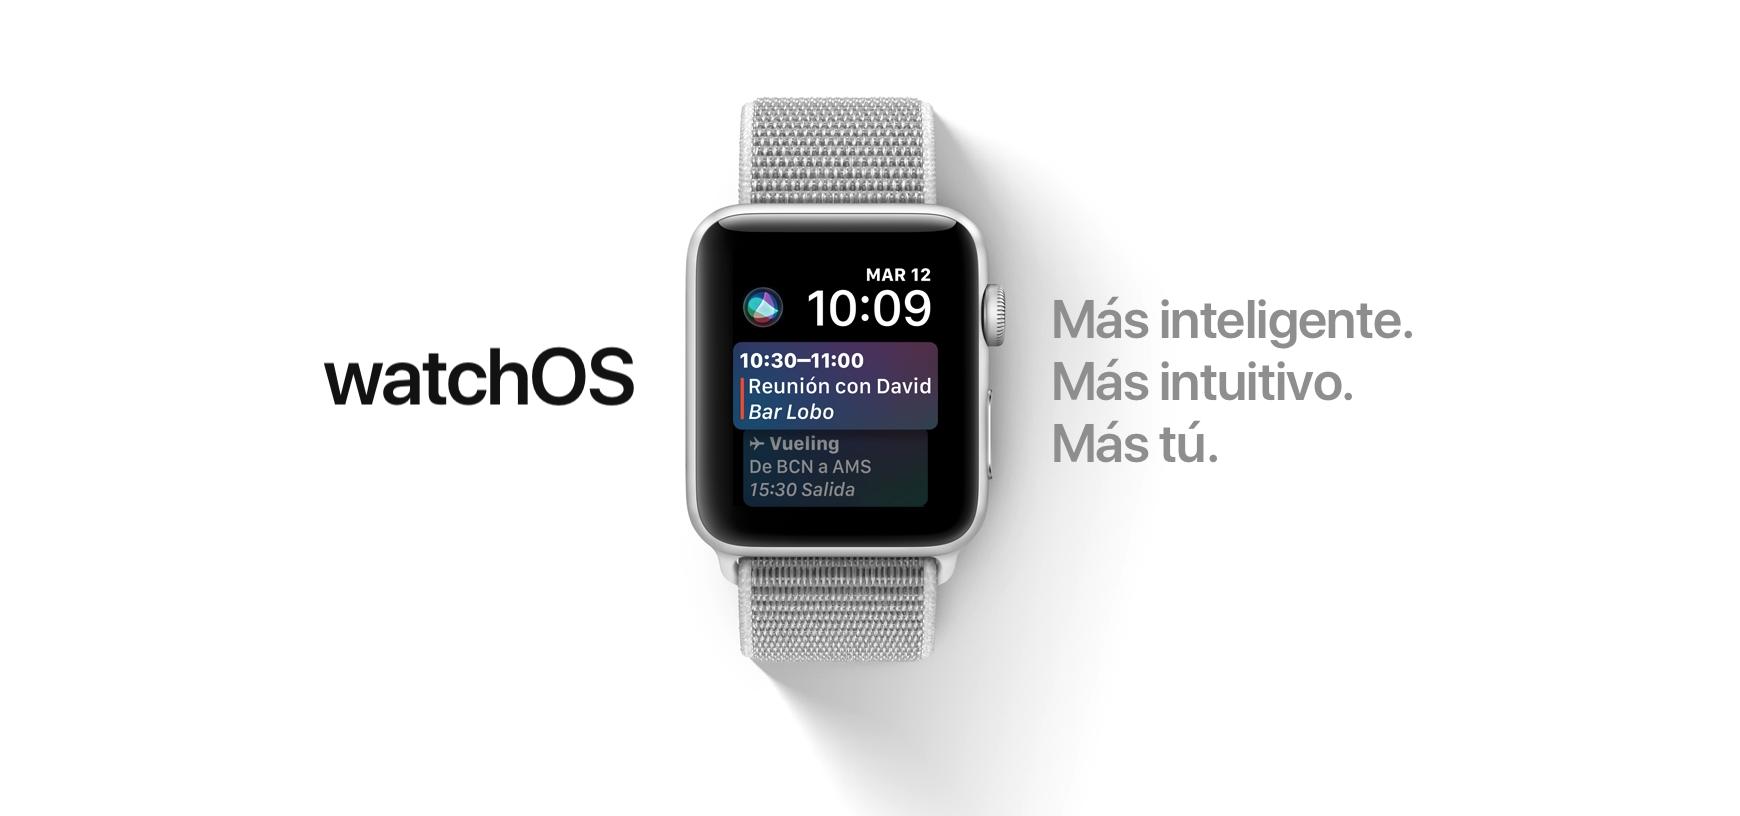 watchOS 4 Apple Watch Series 3